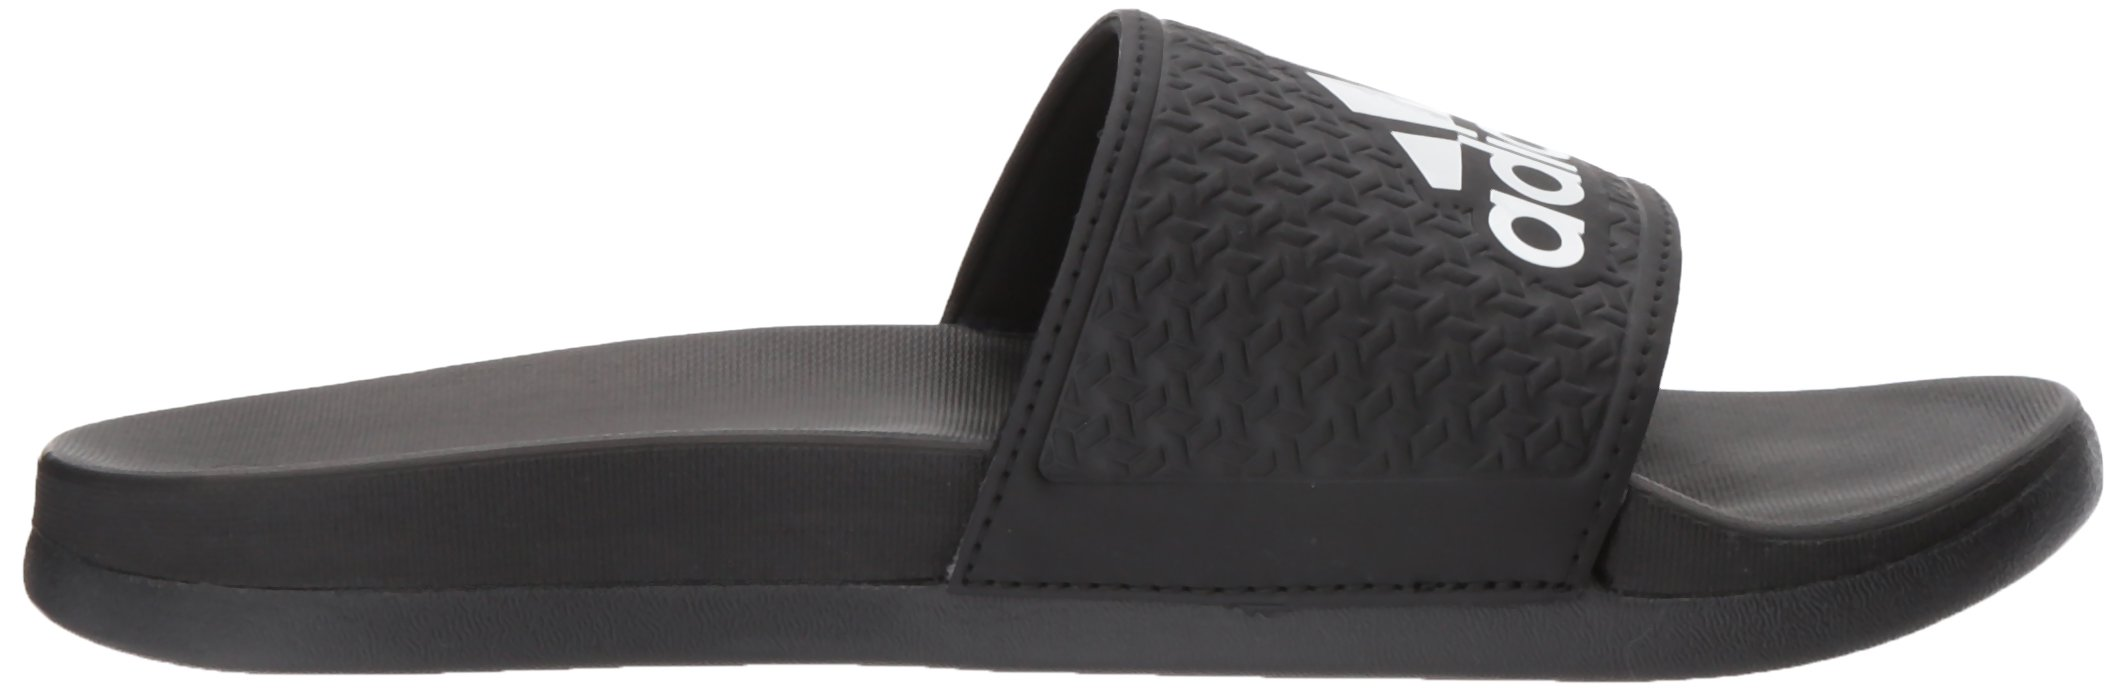 adidas Unisex-Kids Adilette Clf+ K Sandal,core black,White, core black,6 M US Big Kid by adidas (Image #7)